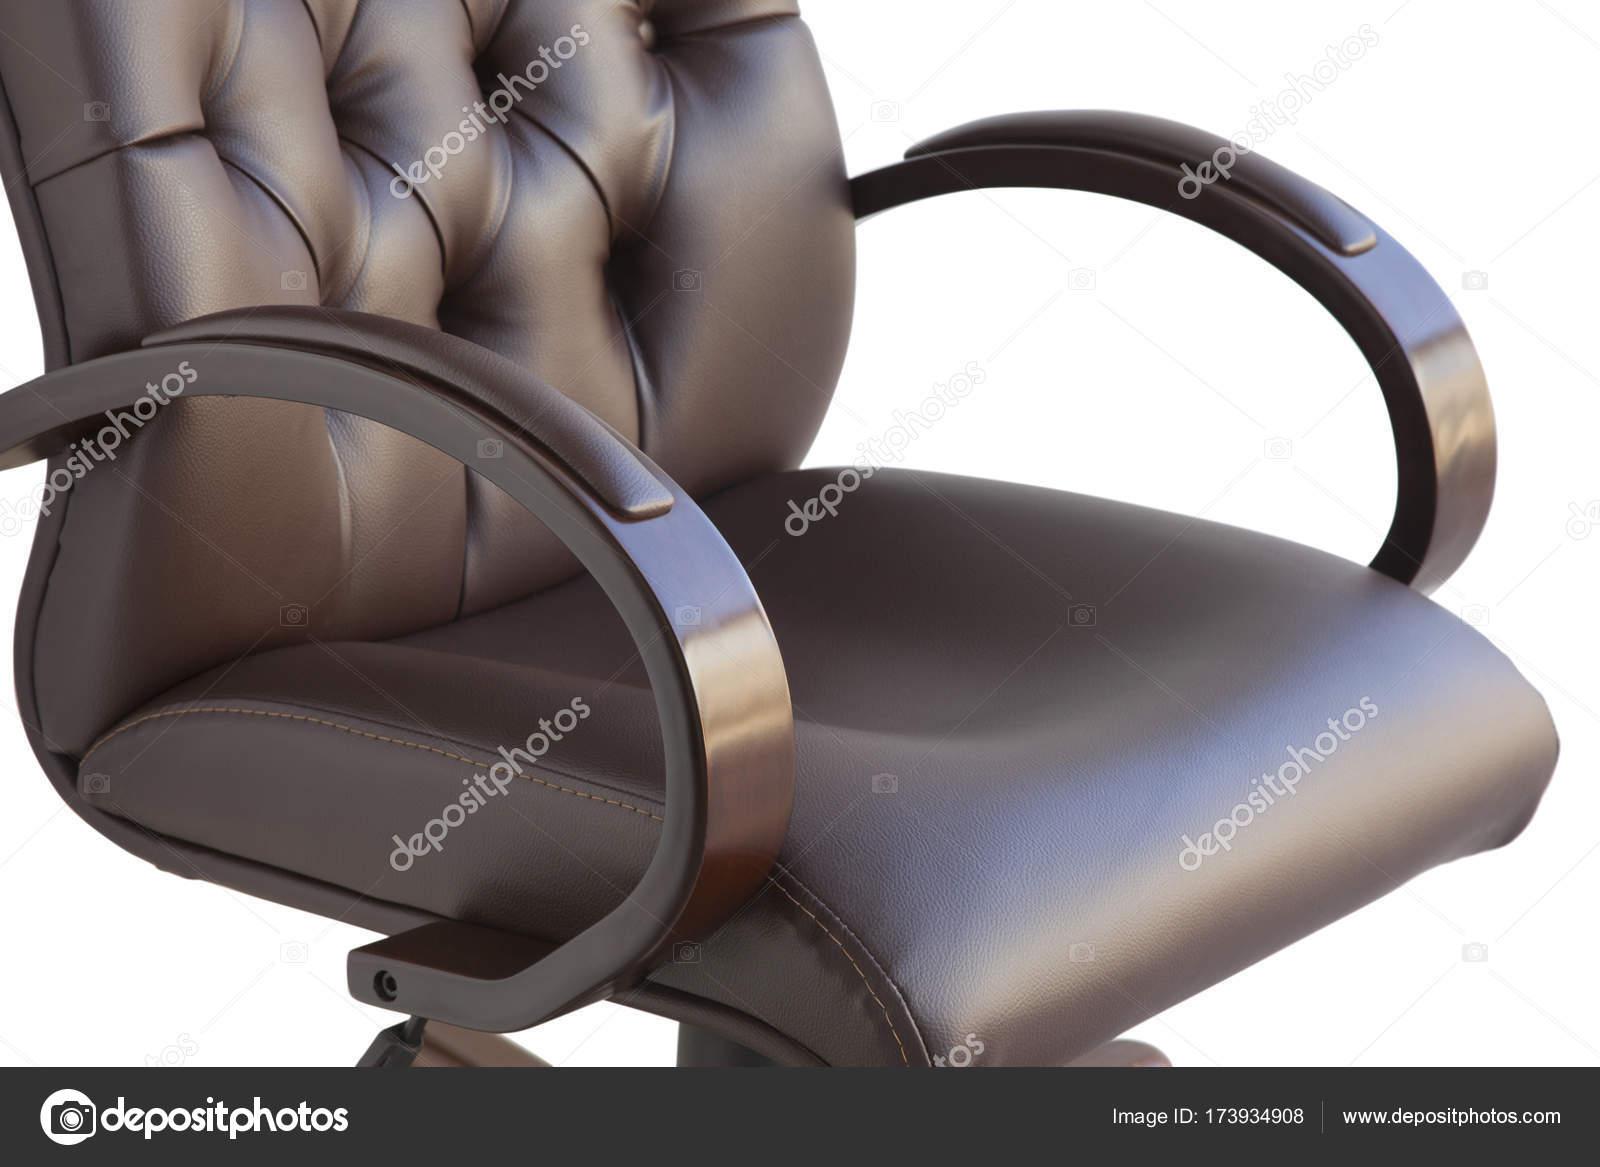 Zwarte bureau stoel achtergrond u2014 stockfoto © reflex safak #173934908